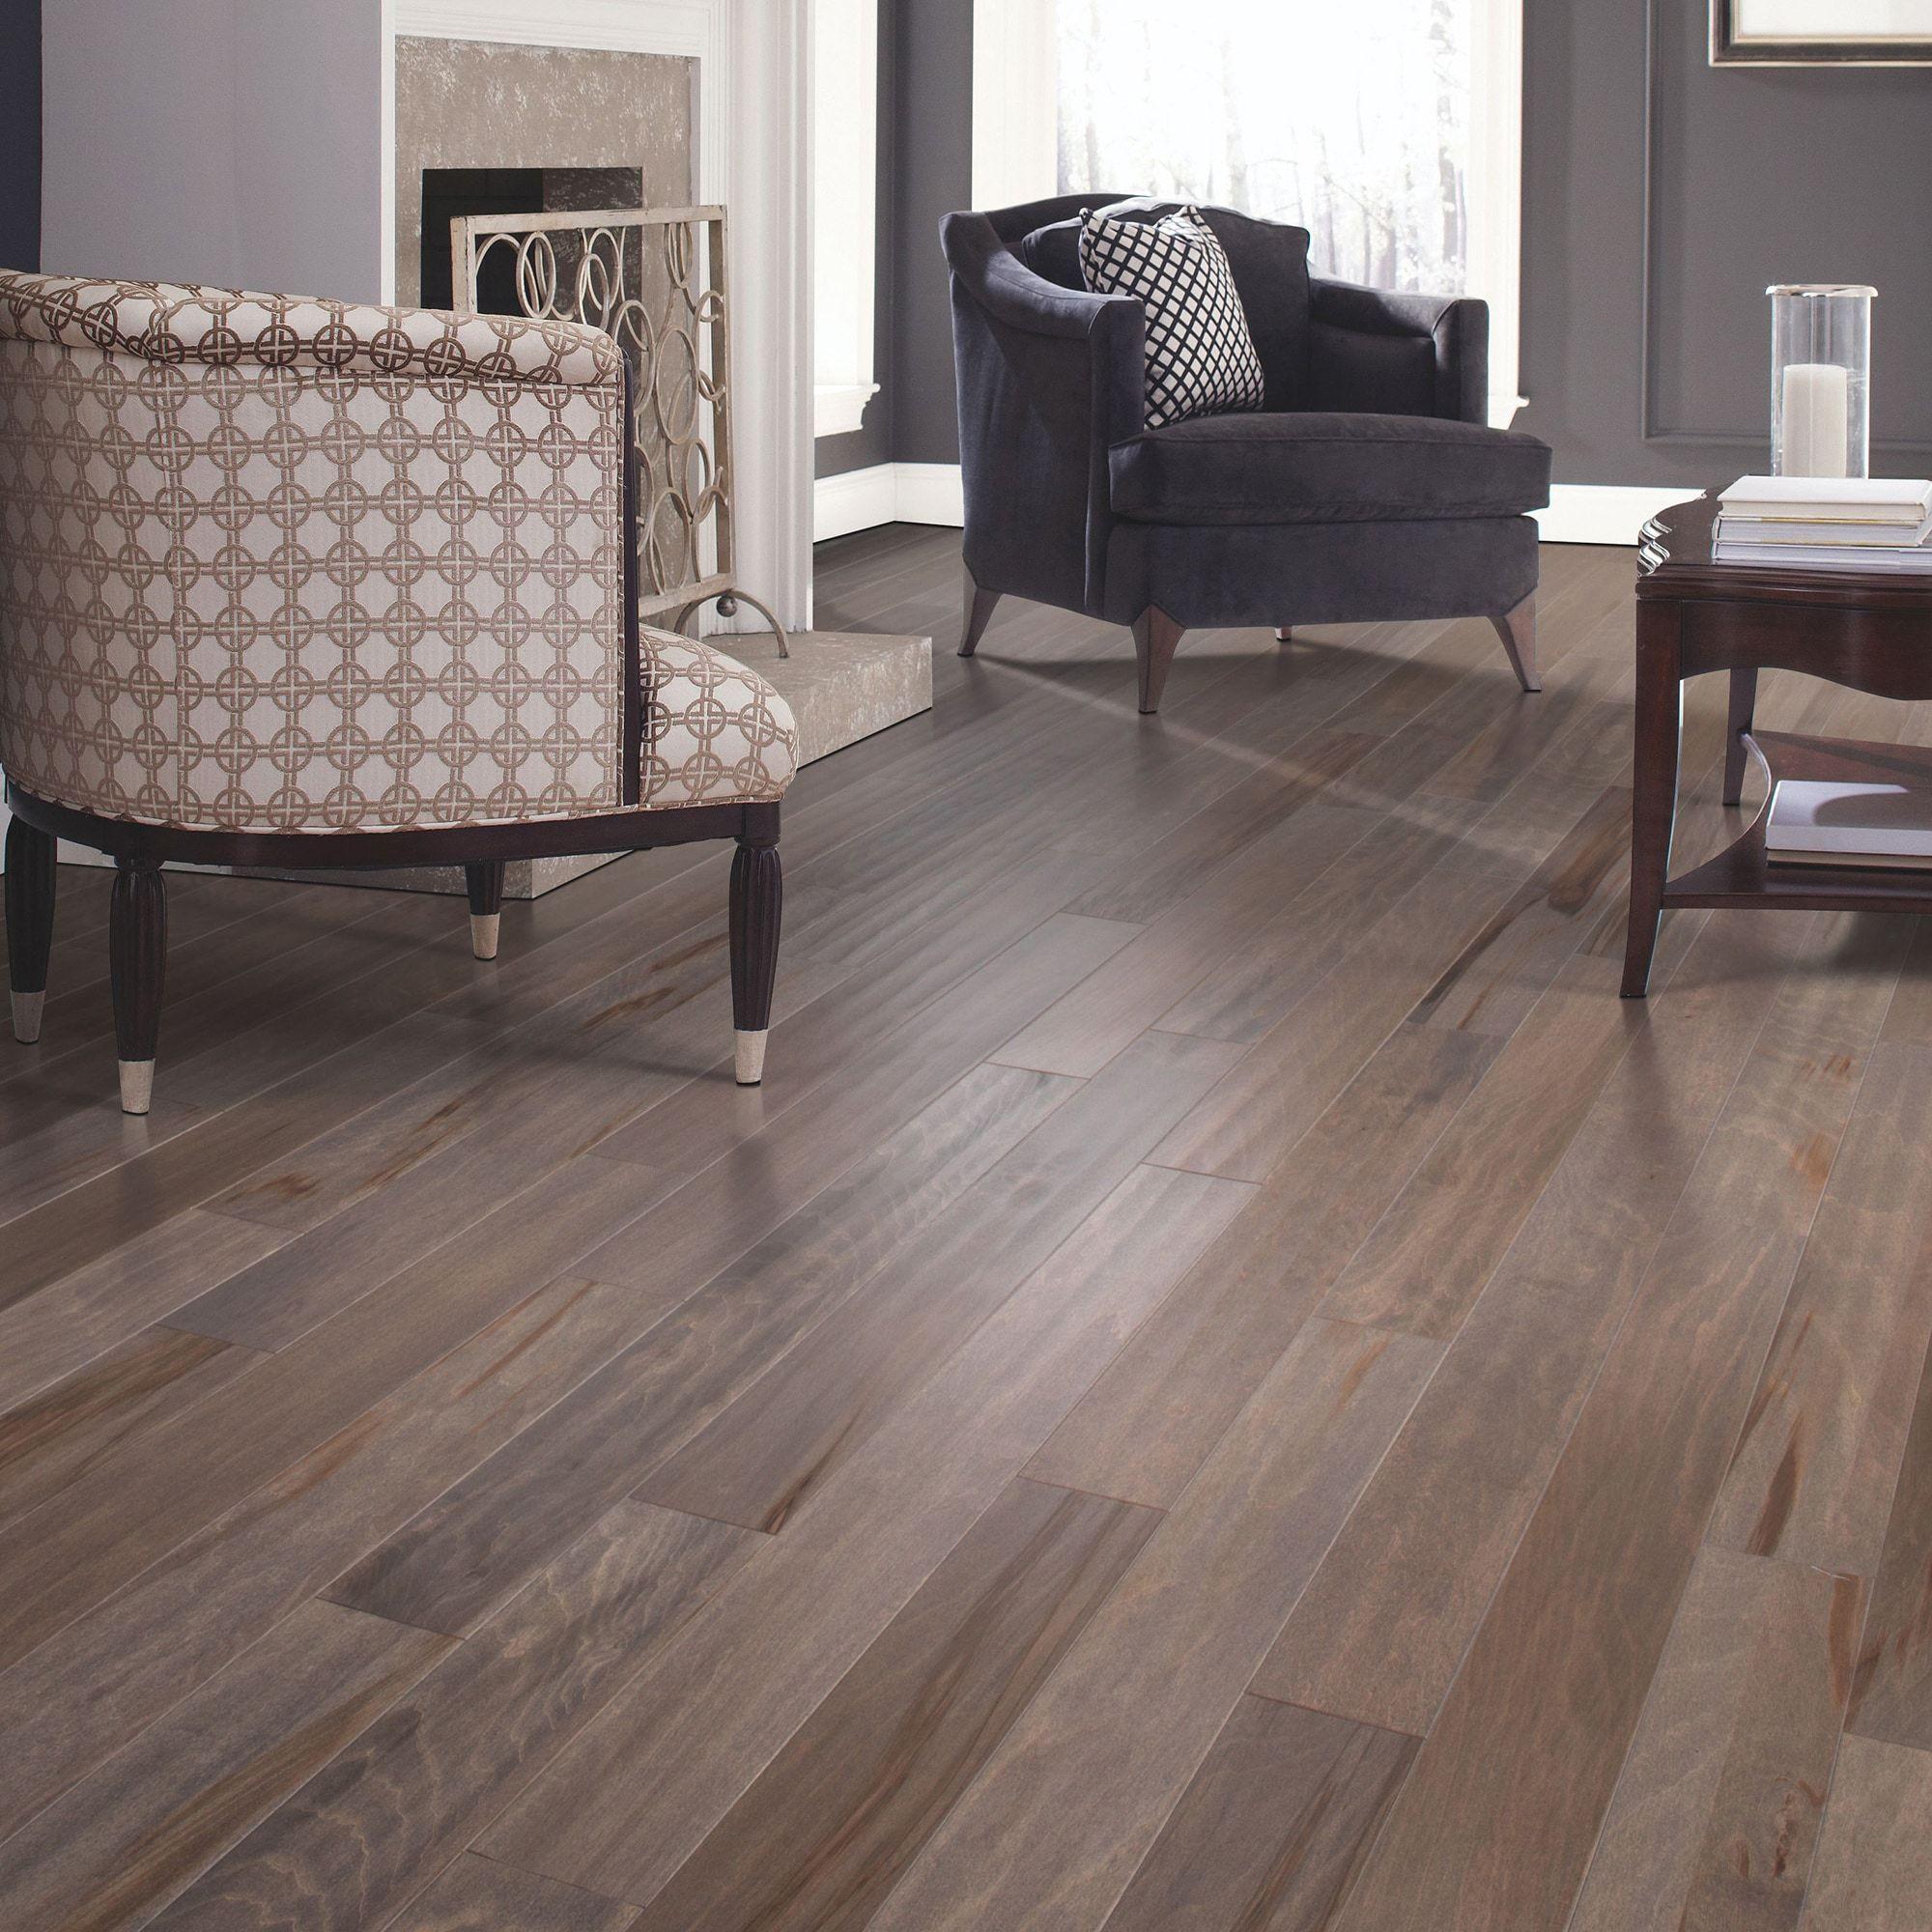 ideal humidity for hardwood floors of builddirecta mohawk flooring engineered hardwood ageless allure throughout builddirecta mohawk flooring engineered hardwood ageless allure collection